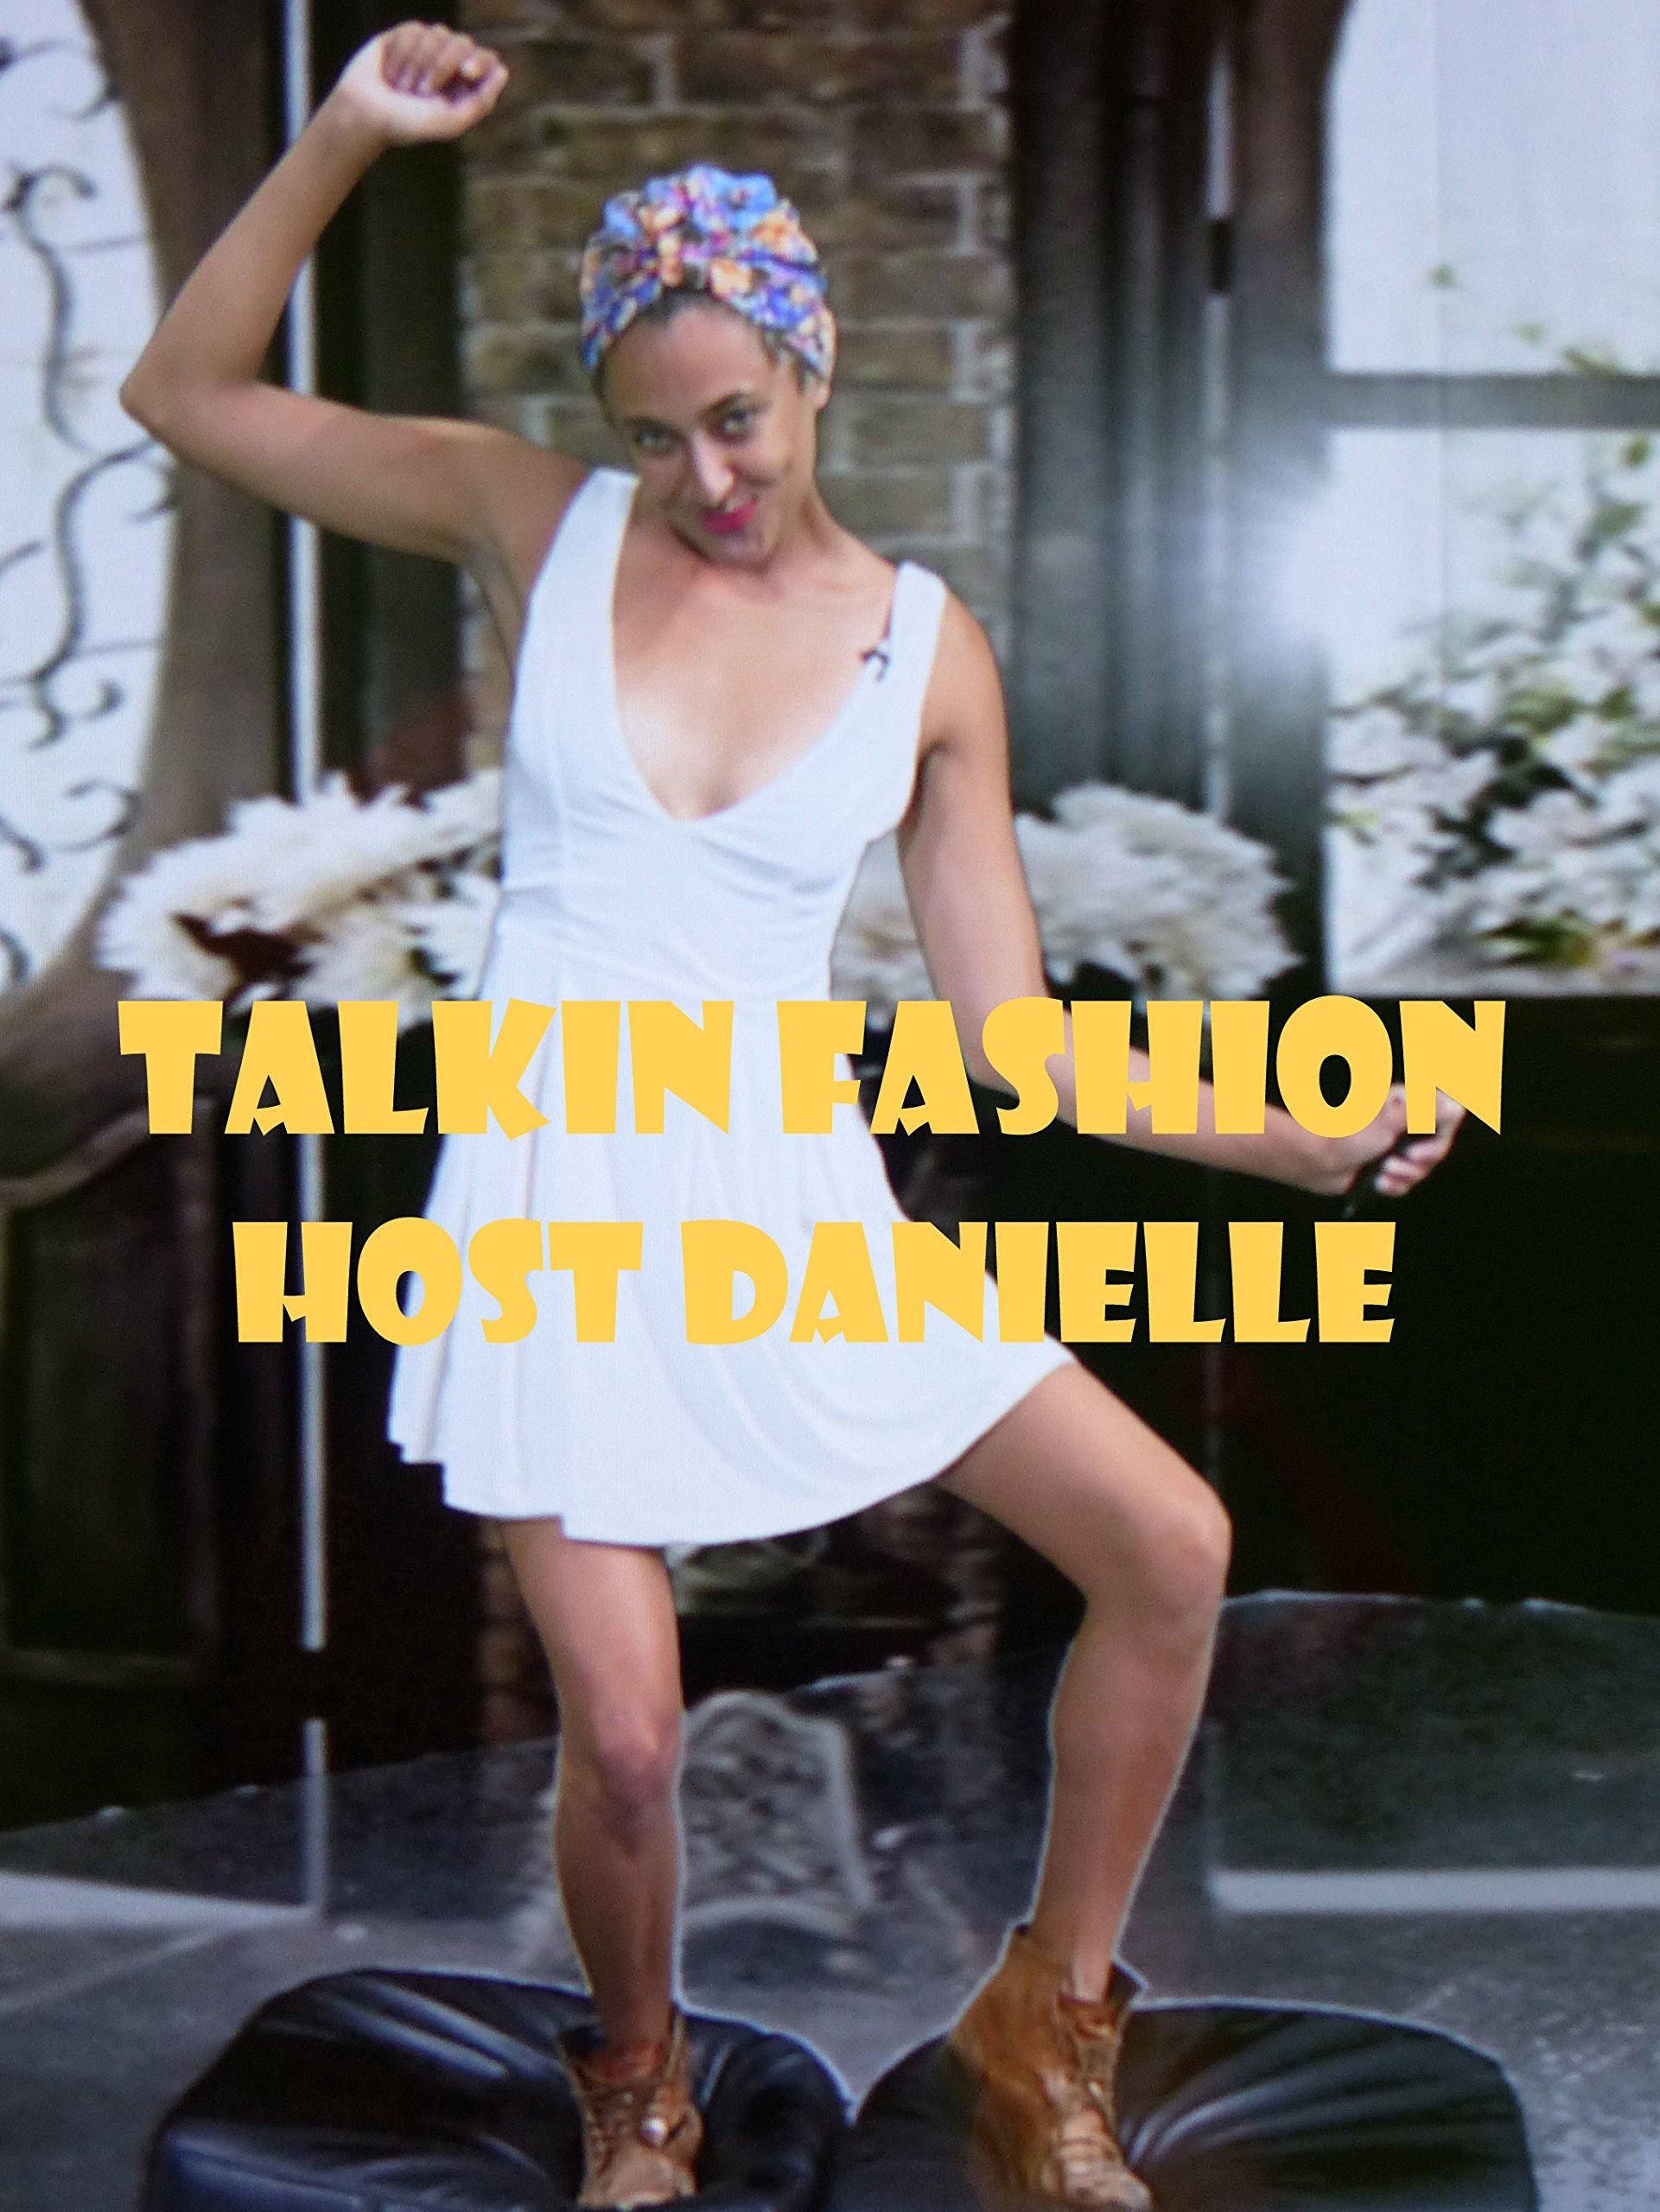 Talkin Fashion W/Host Danielle